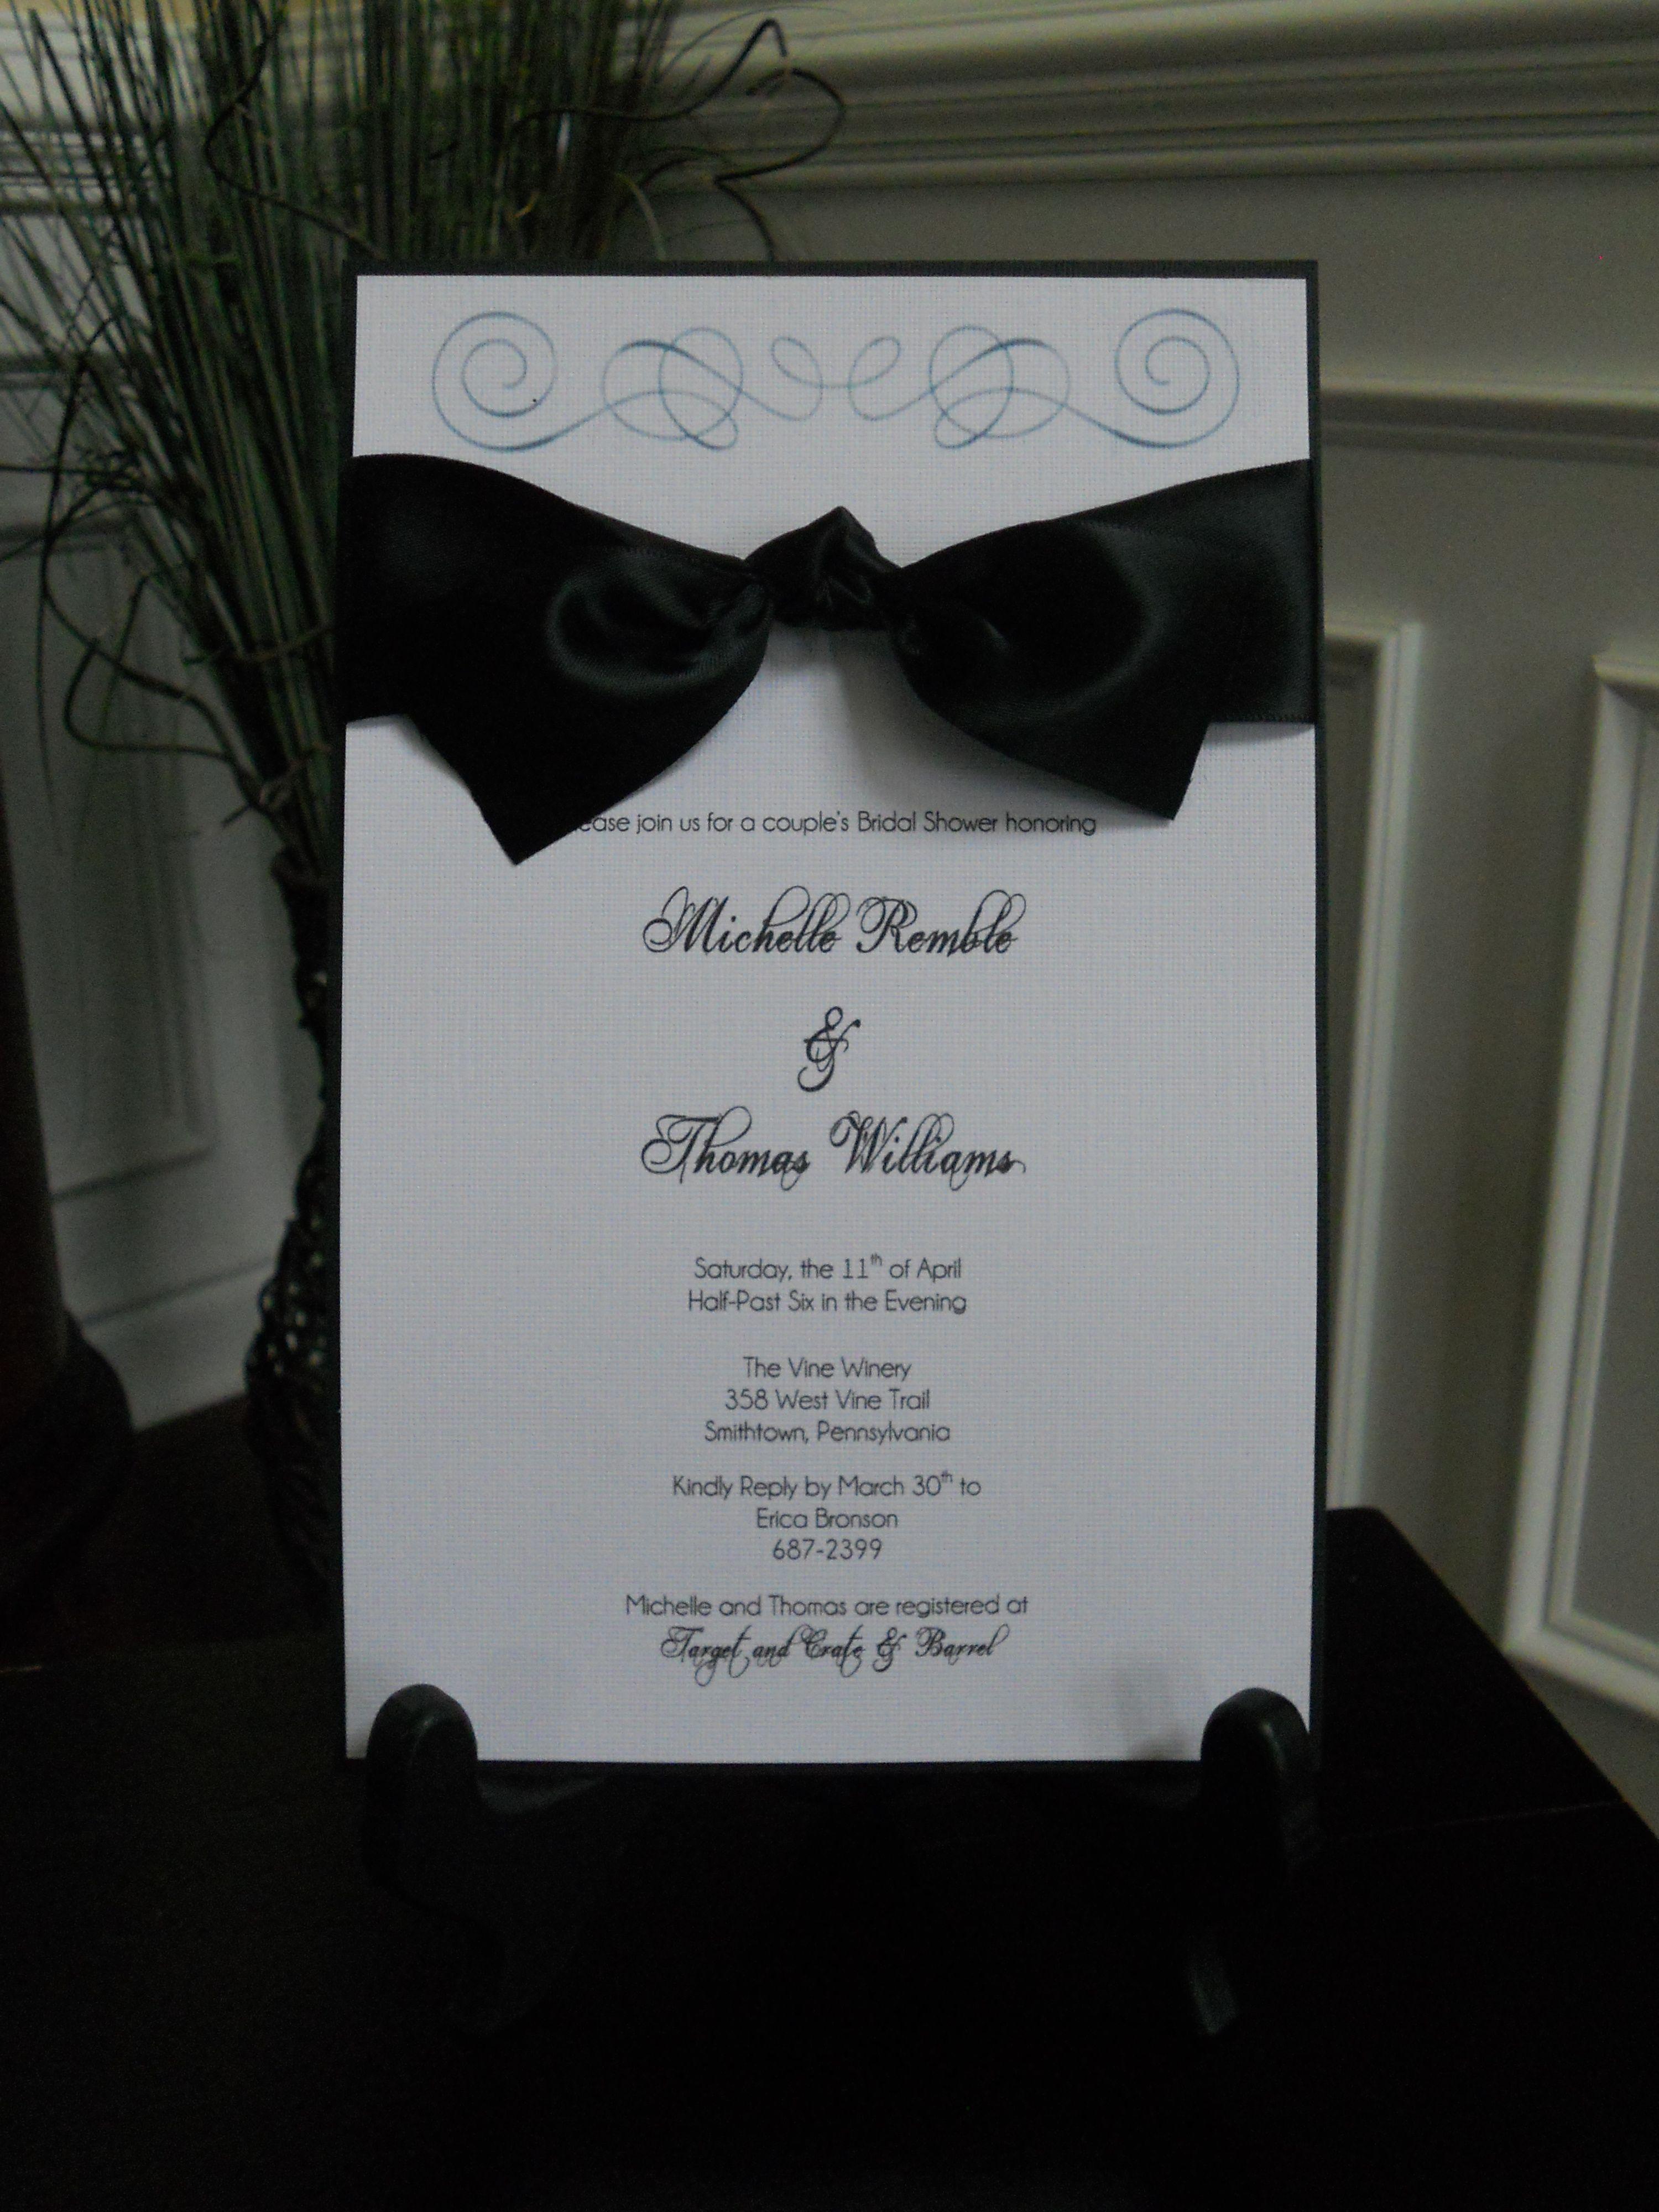 Homemade wedding invitations homemade invitations bridal10 2 images for homemade rustic bridal shower invitations 2015 2016 solutioingenieria Choice Image